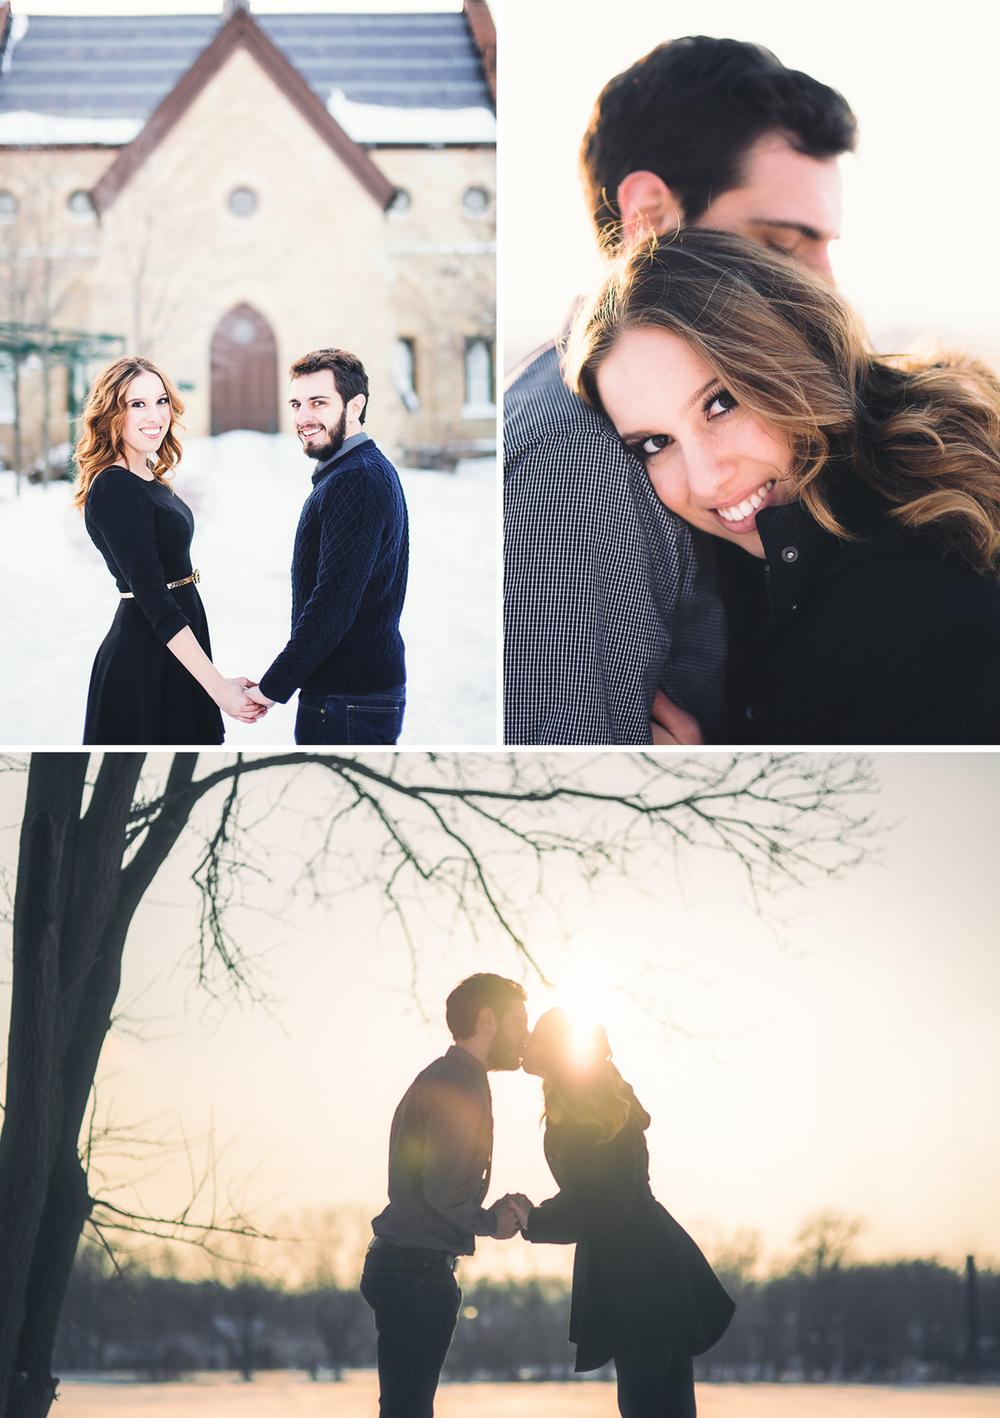 Chicago_Fine_Art_Wedding_Photography_Alex&Chris1.jpg